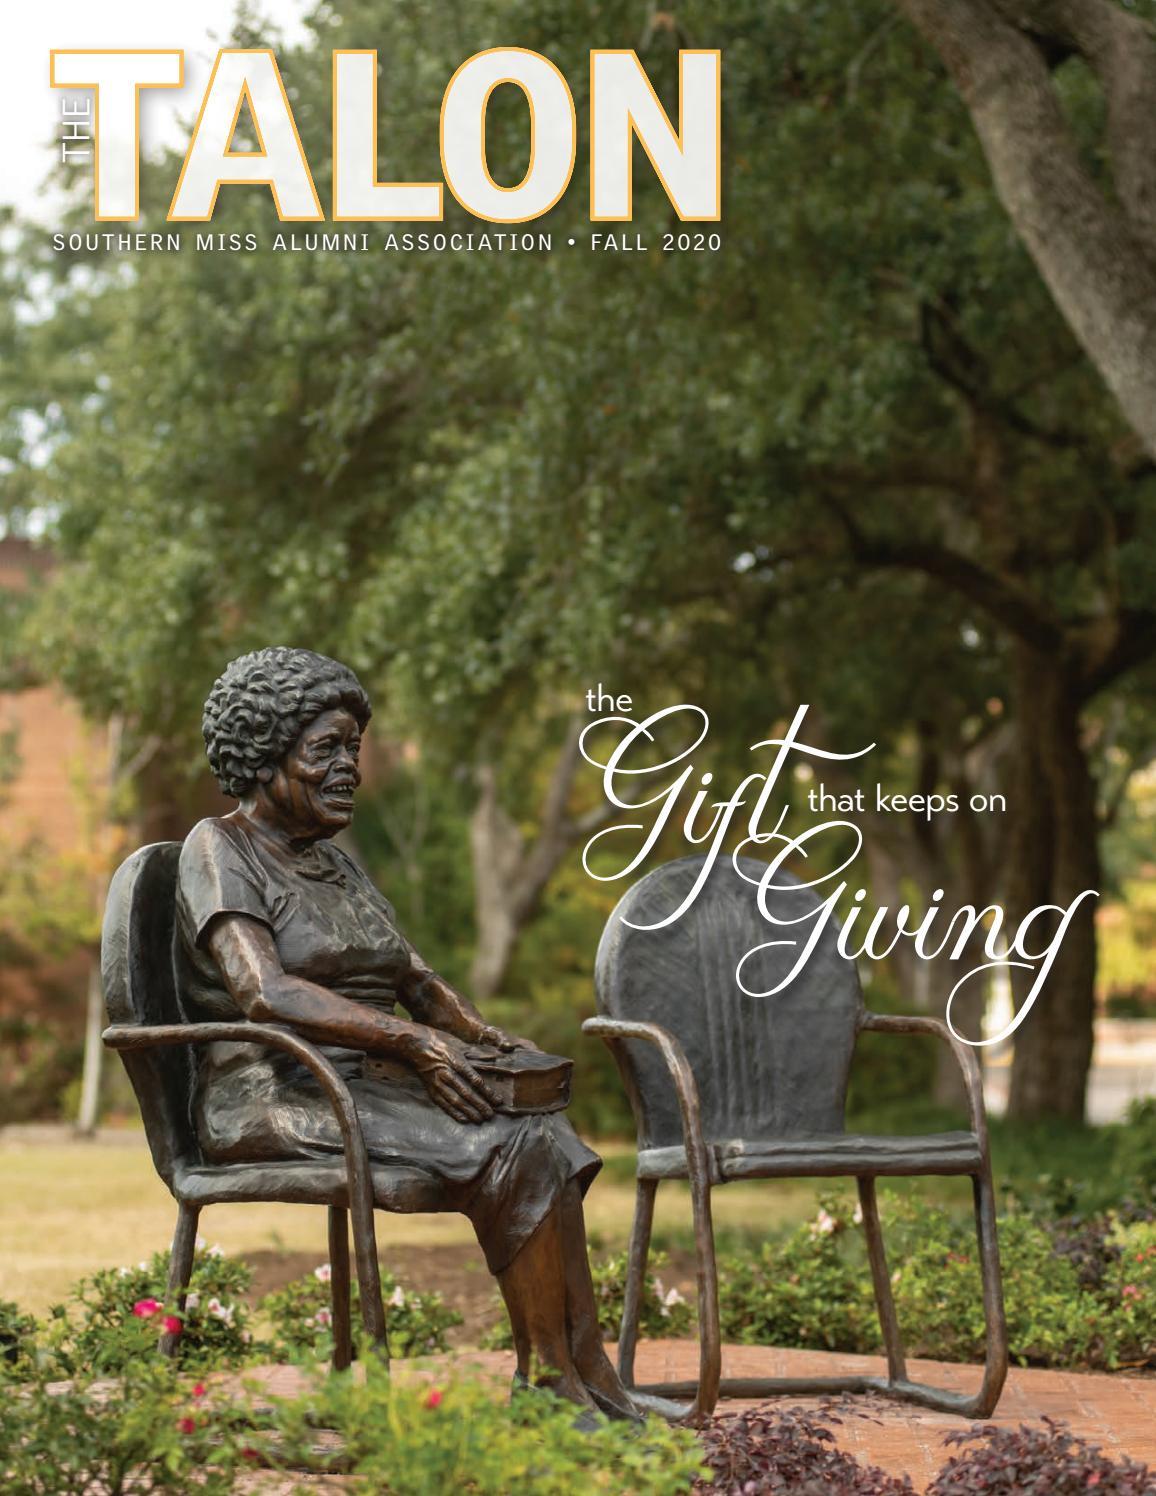 The Talon Fall 2020 By Southern Miss Alumni Association Issuu